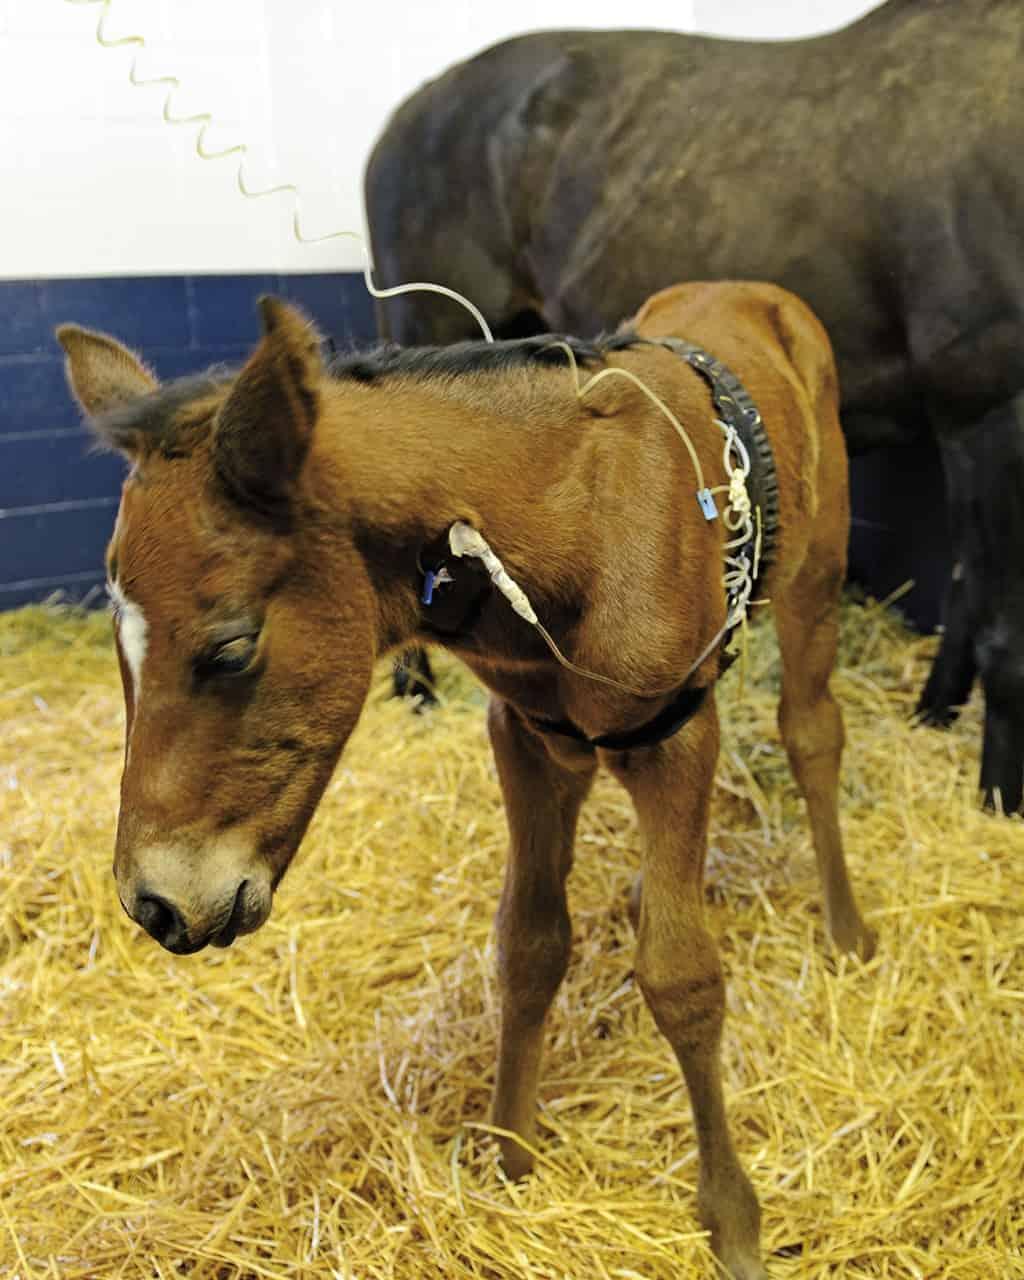 foals - photo #17